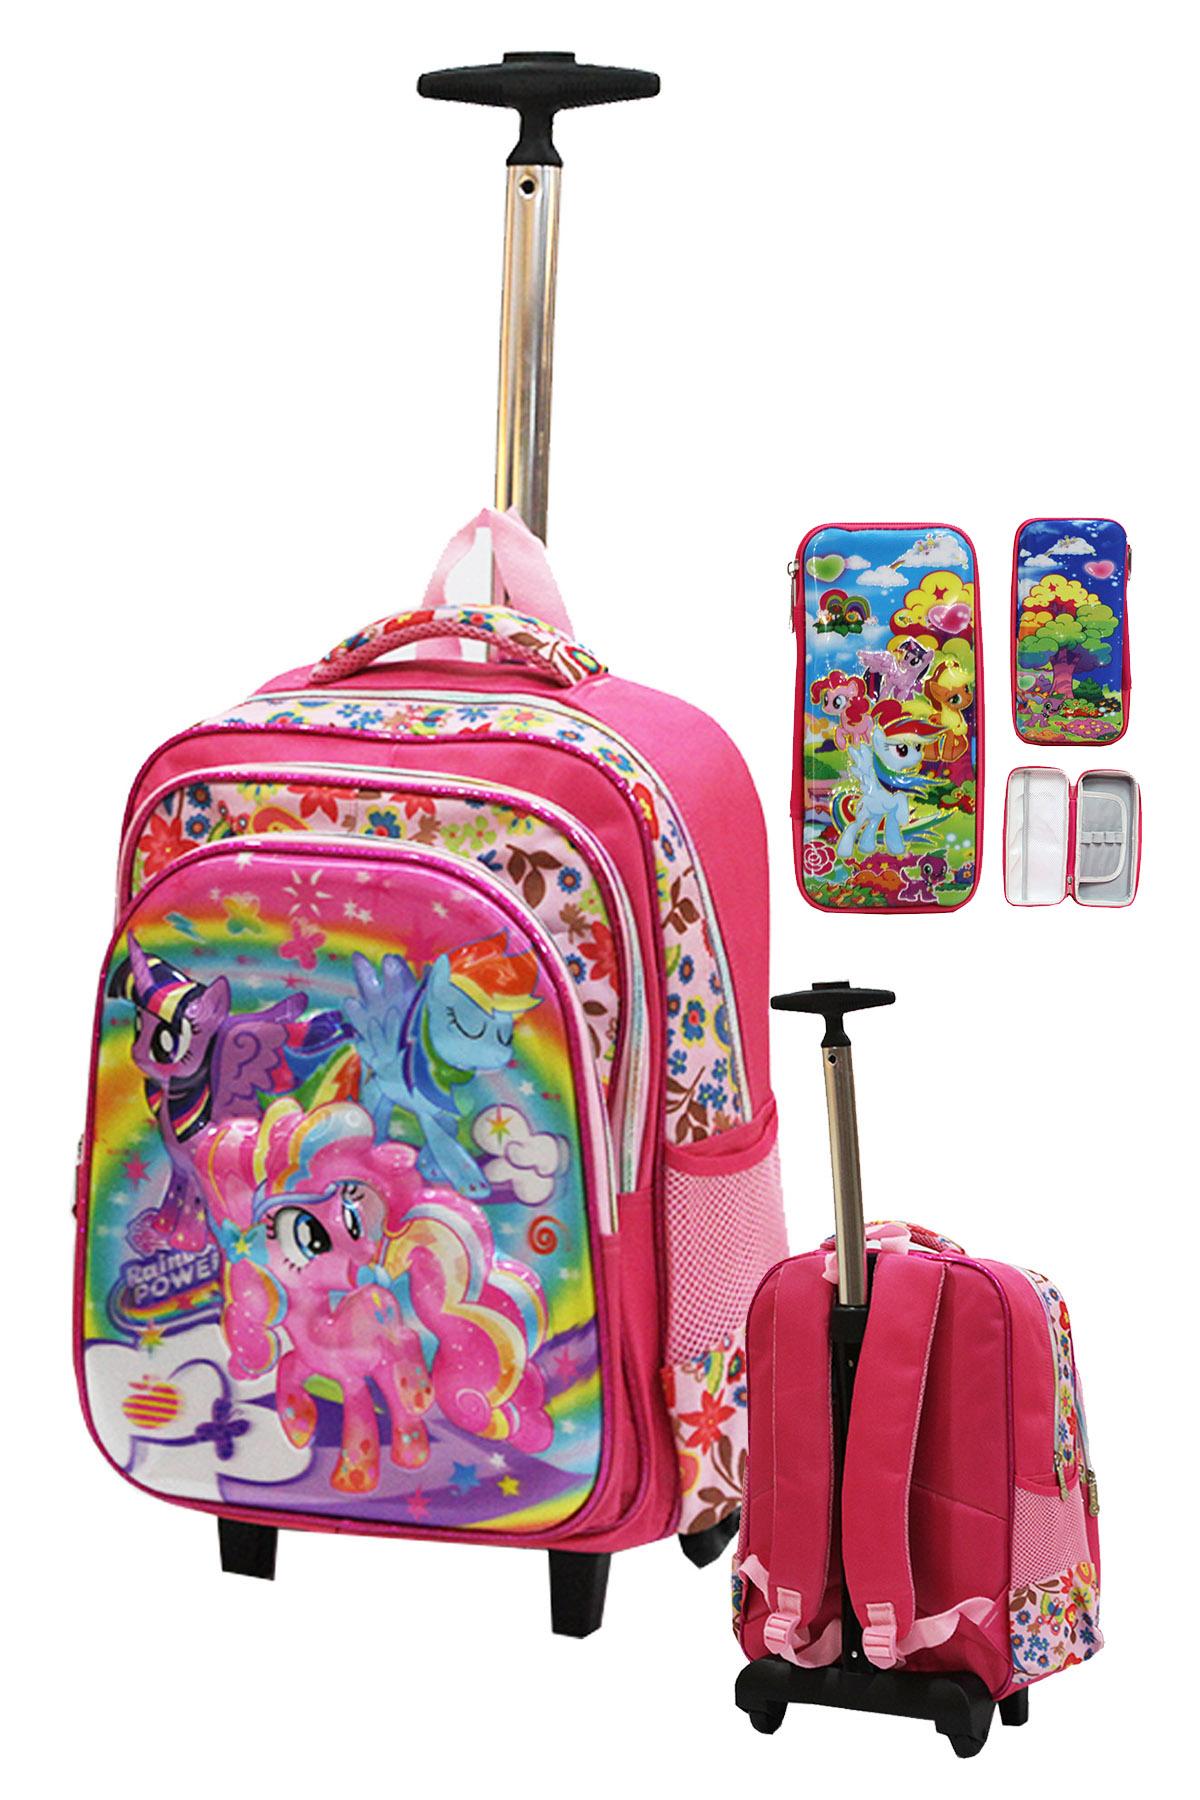 Home; Onlan My Little Pony Flower 5d Timbul Tas Trolley Sd Gagang Samurai Stainless Import Dan Kotak Pensil Kain Pink. 7085594 912580a2 91ac 48c0 a912 ...